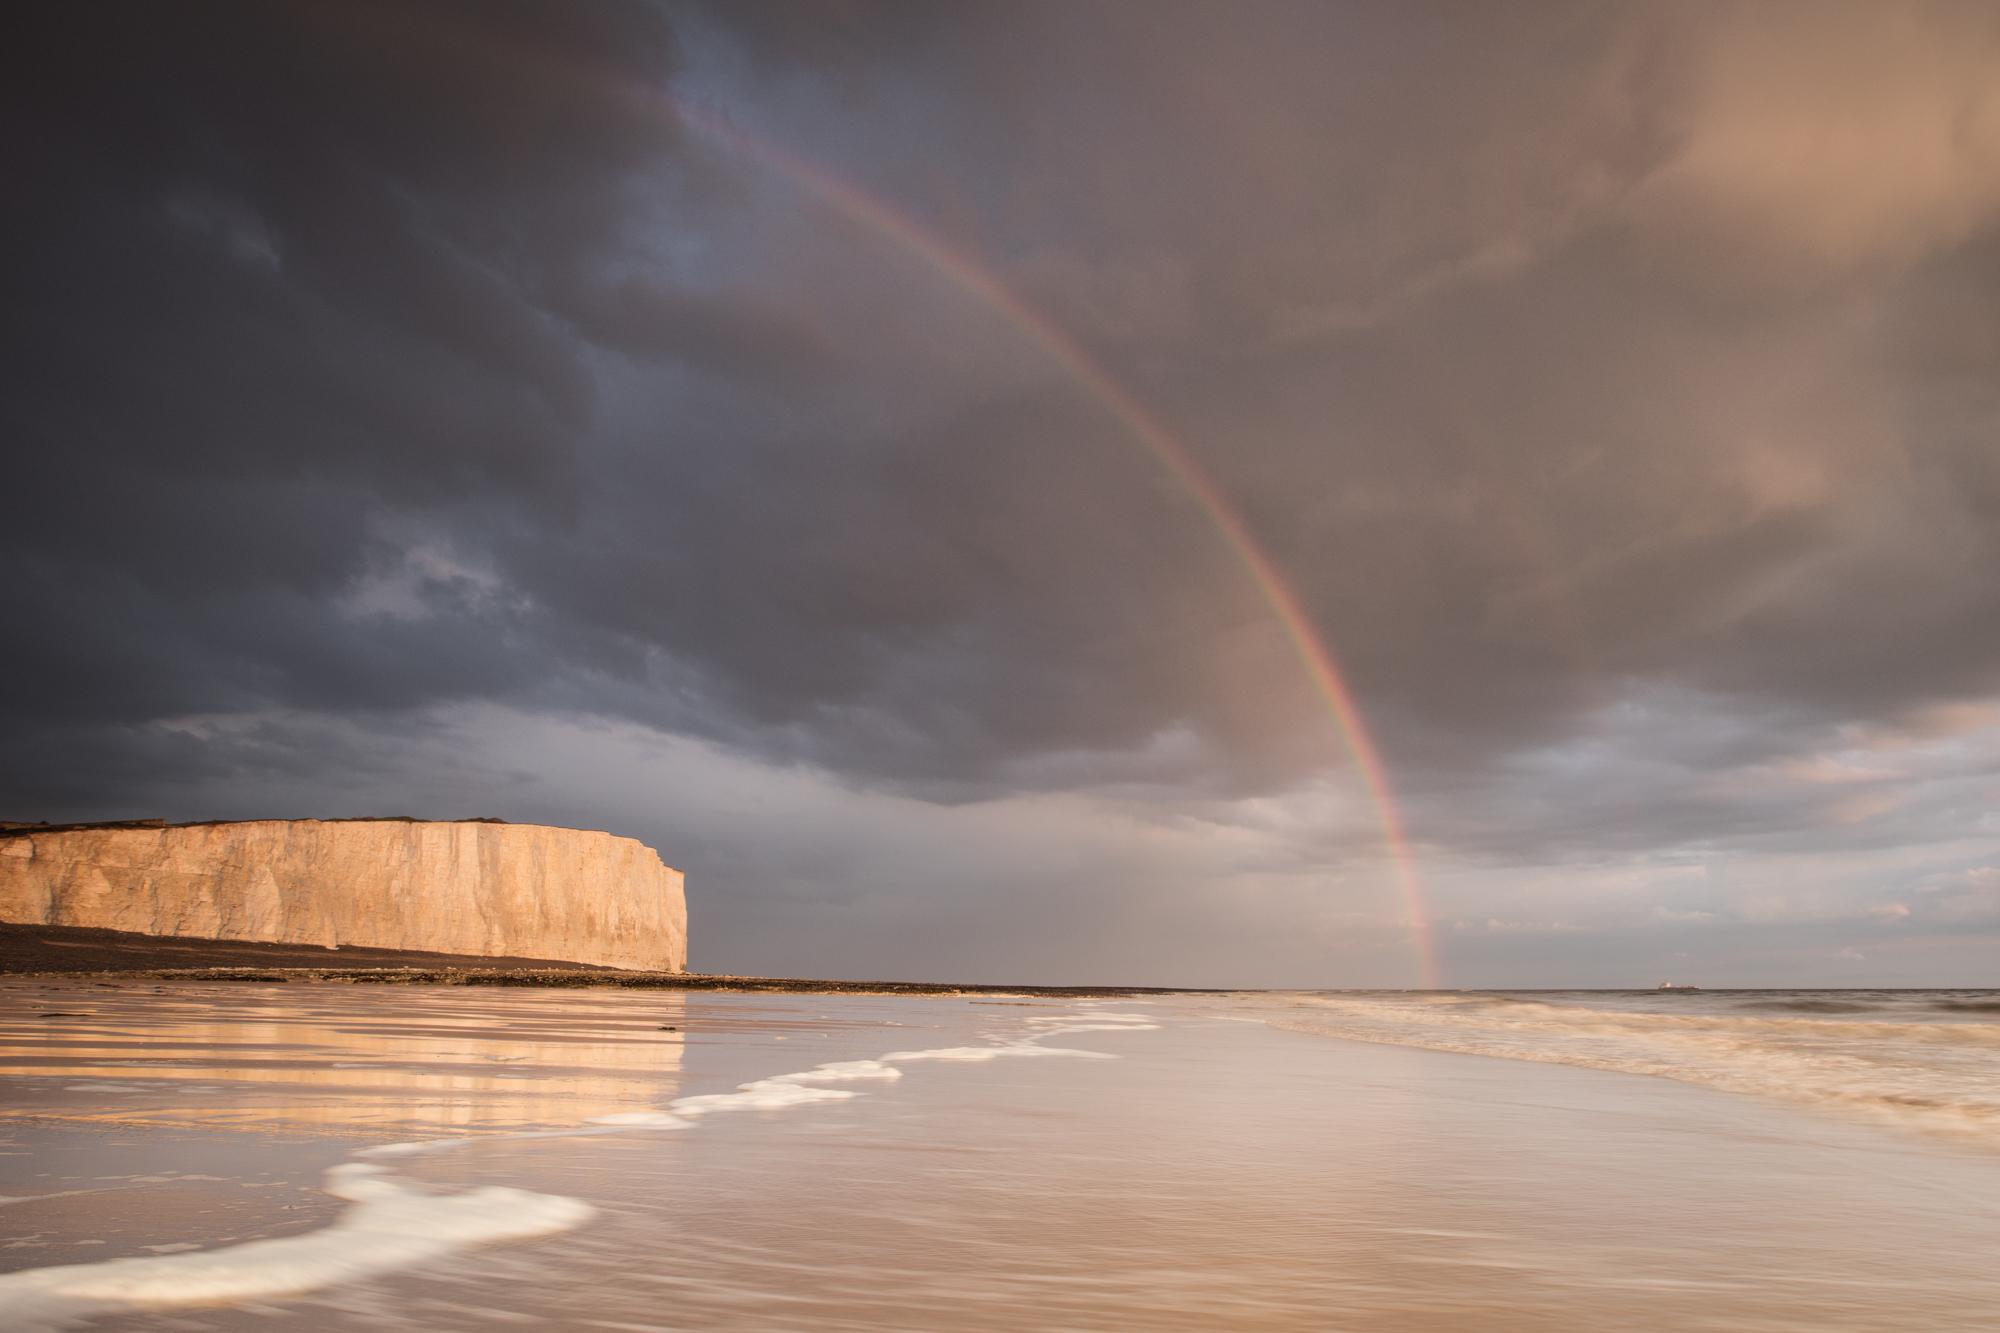 birling-rainbow